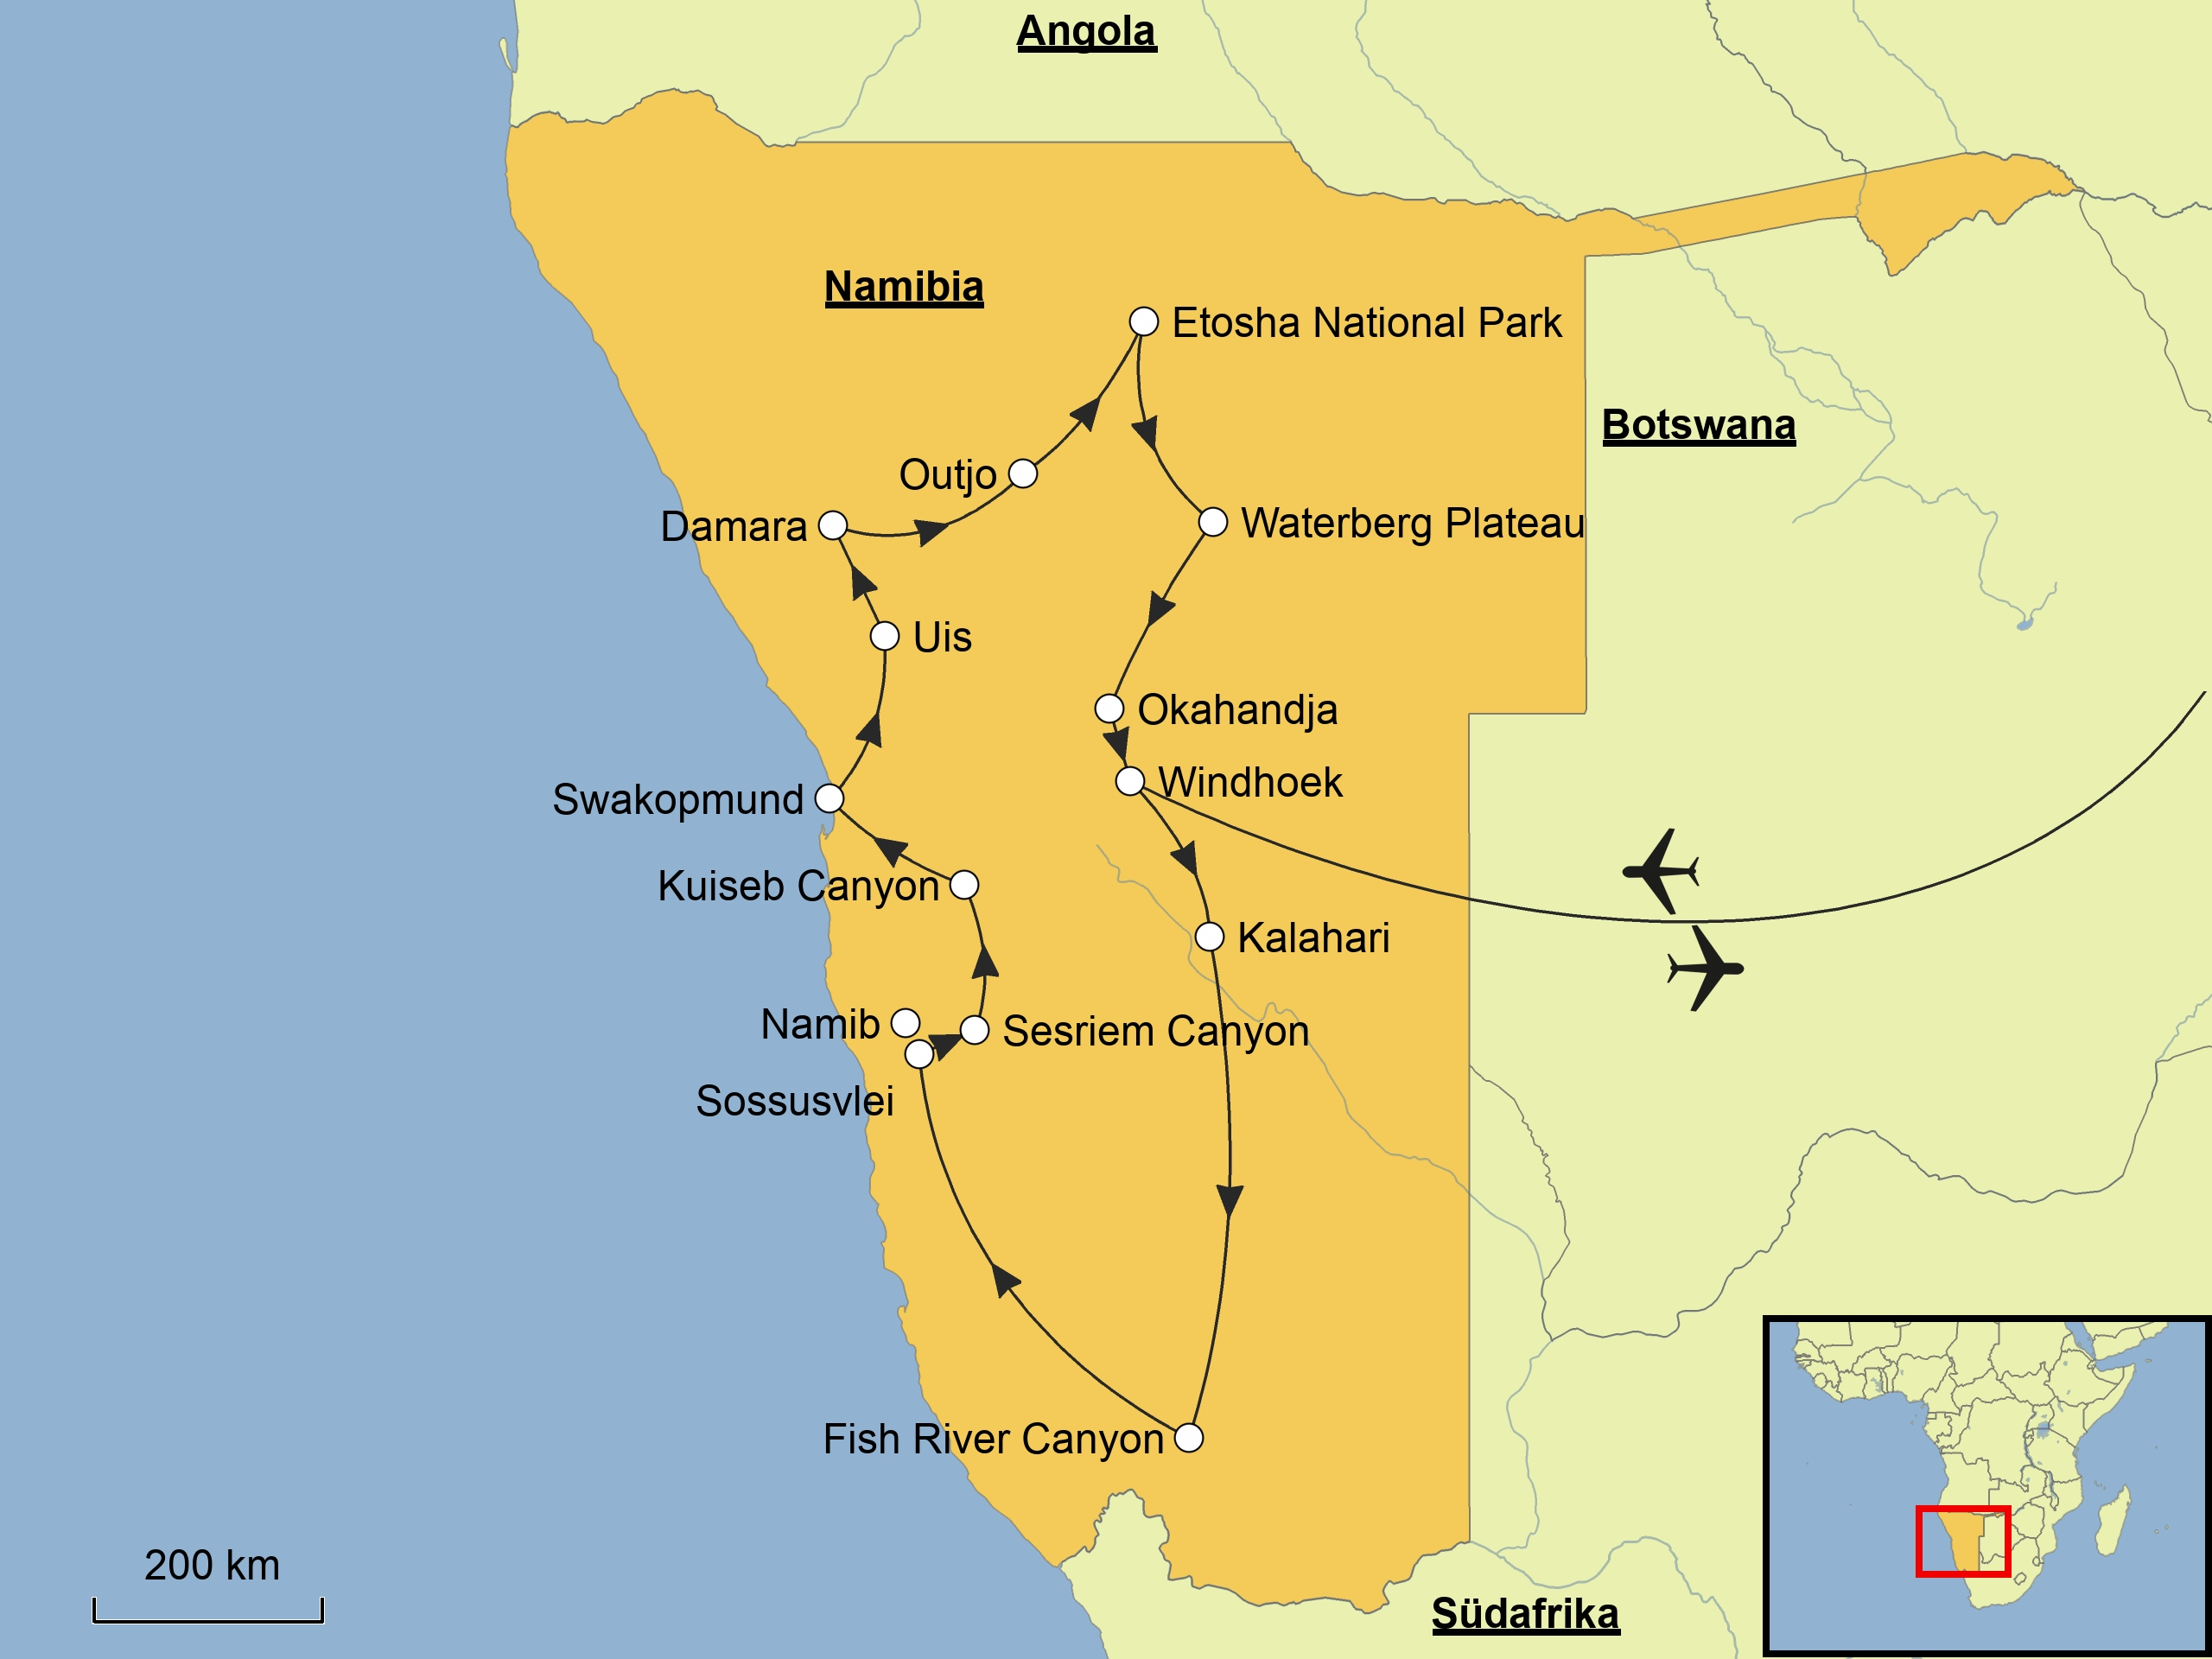 Liportal Namibia Landesubersicht Naturraum Das